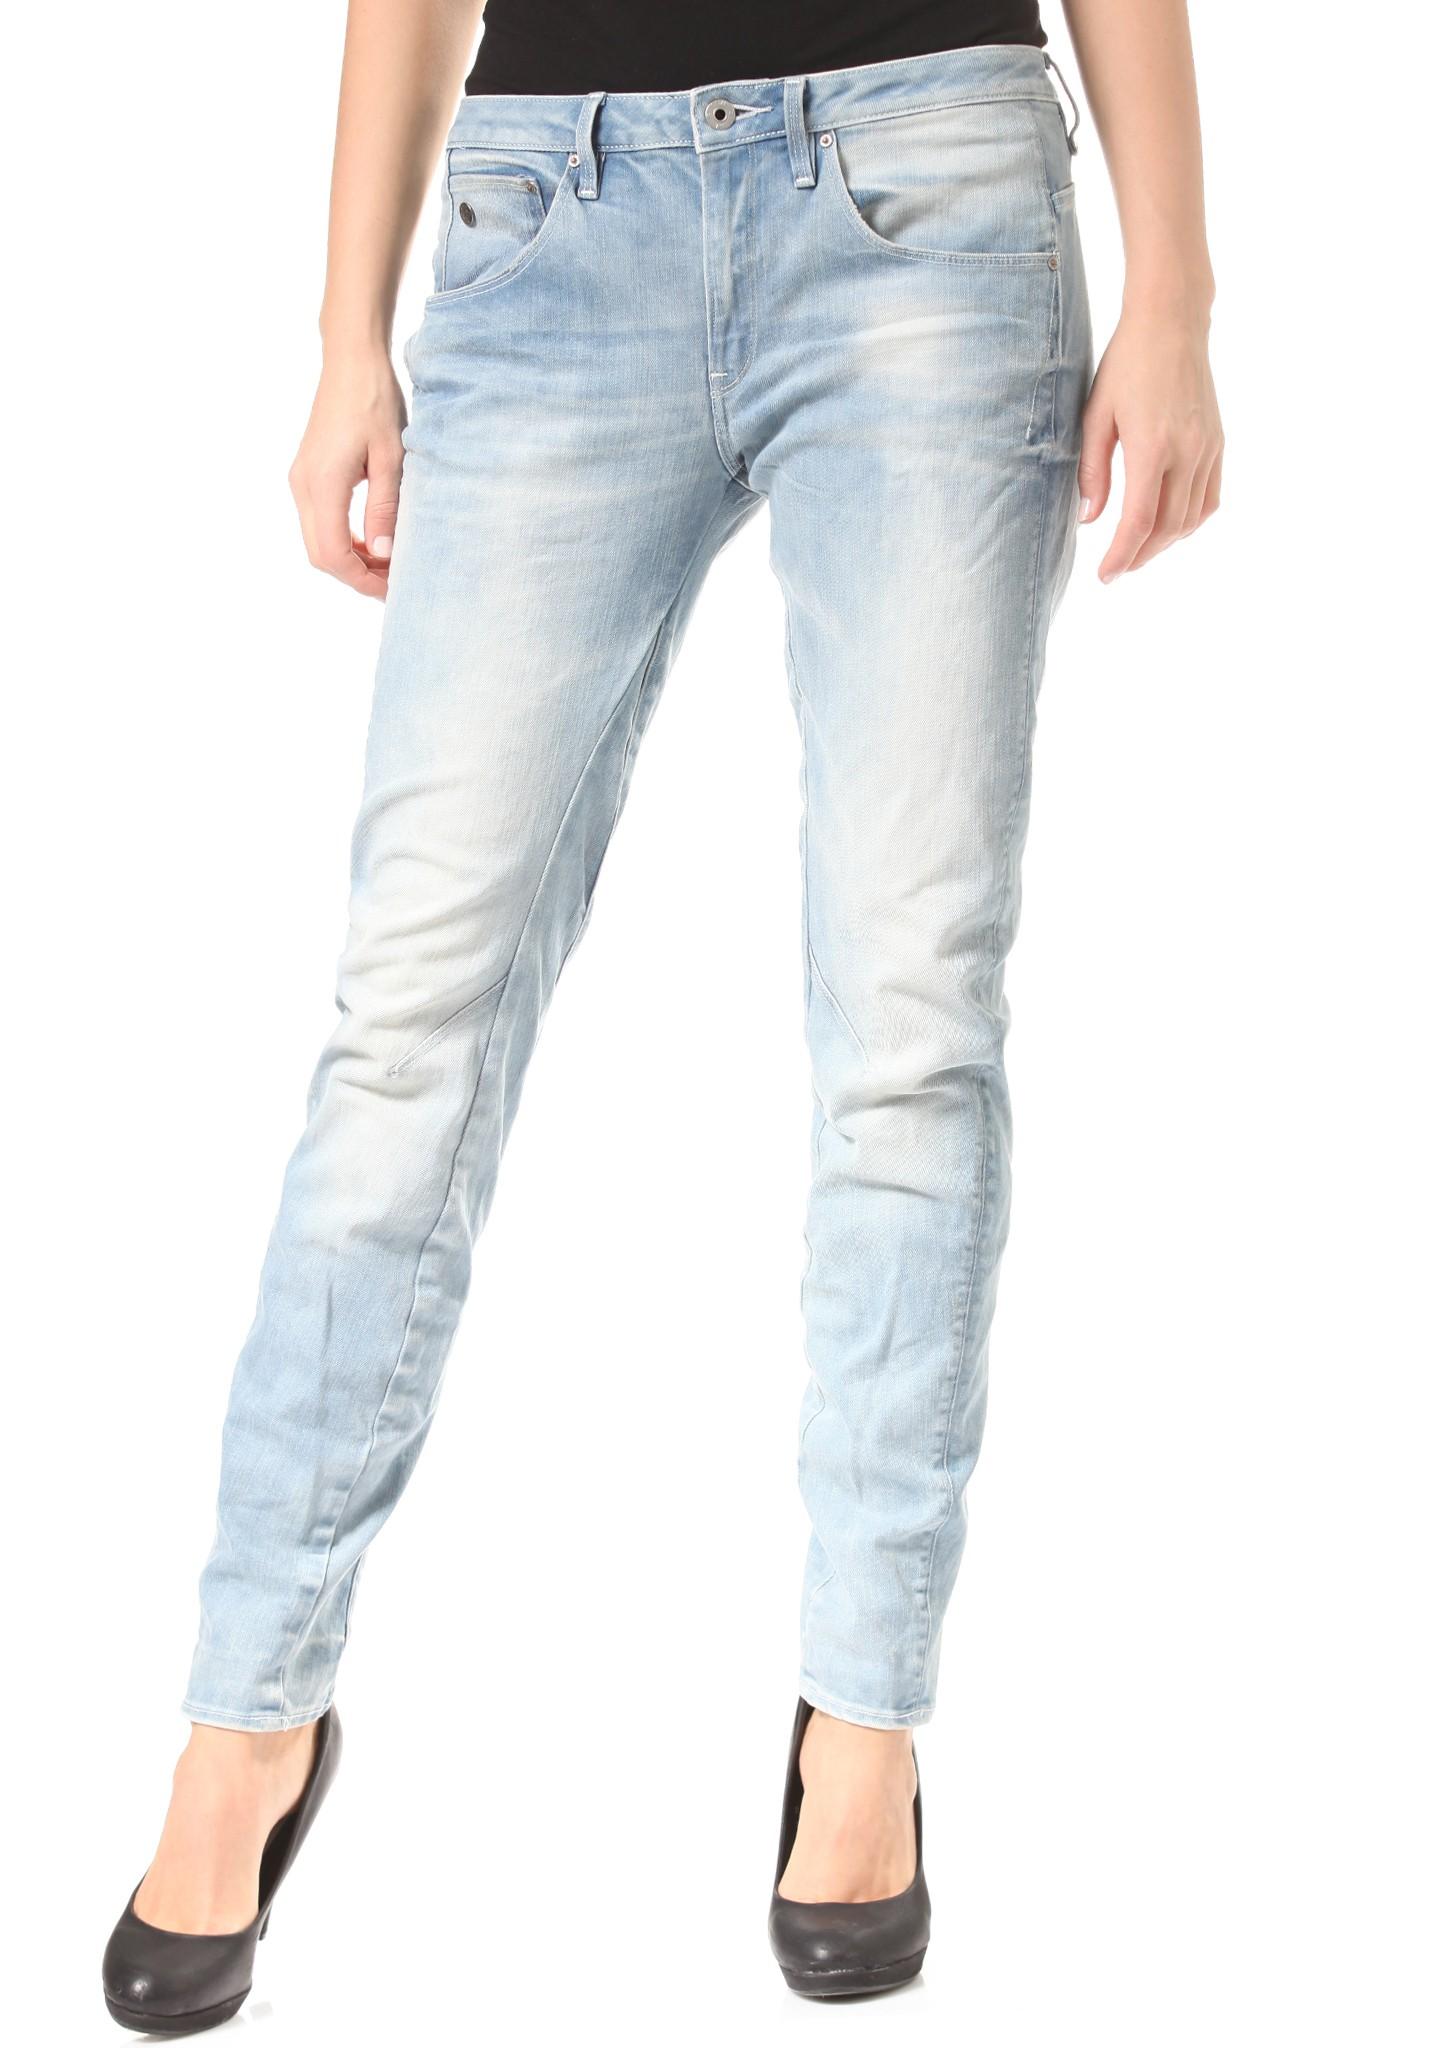 g star arc 3d low boyfriend olary stretch denim pant jeans damen ebay. Black Bedroom Furniture Sets. Home Design Ideas